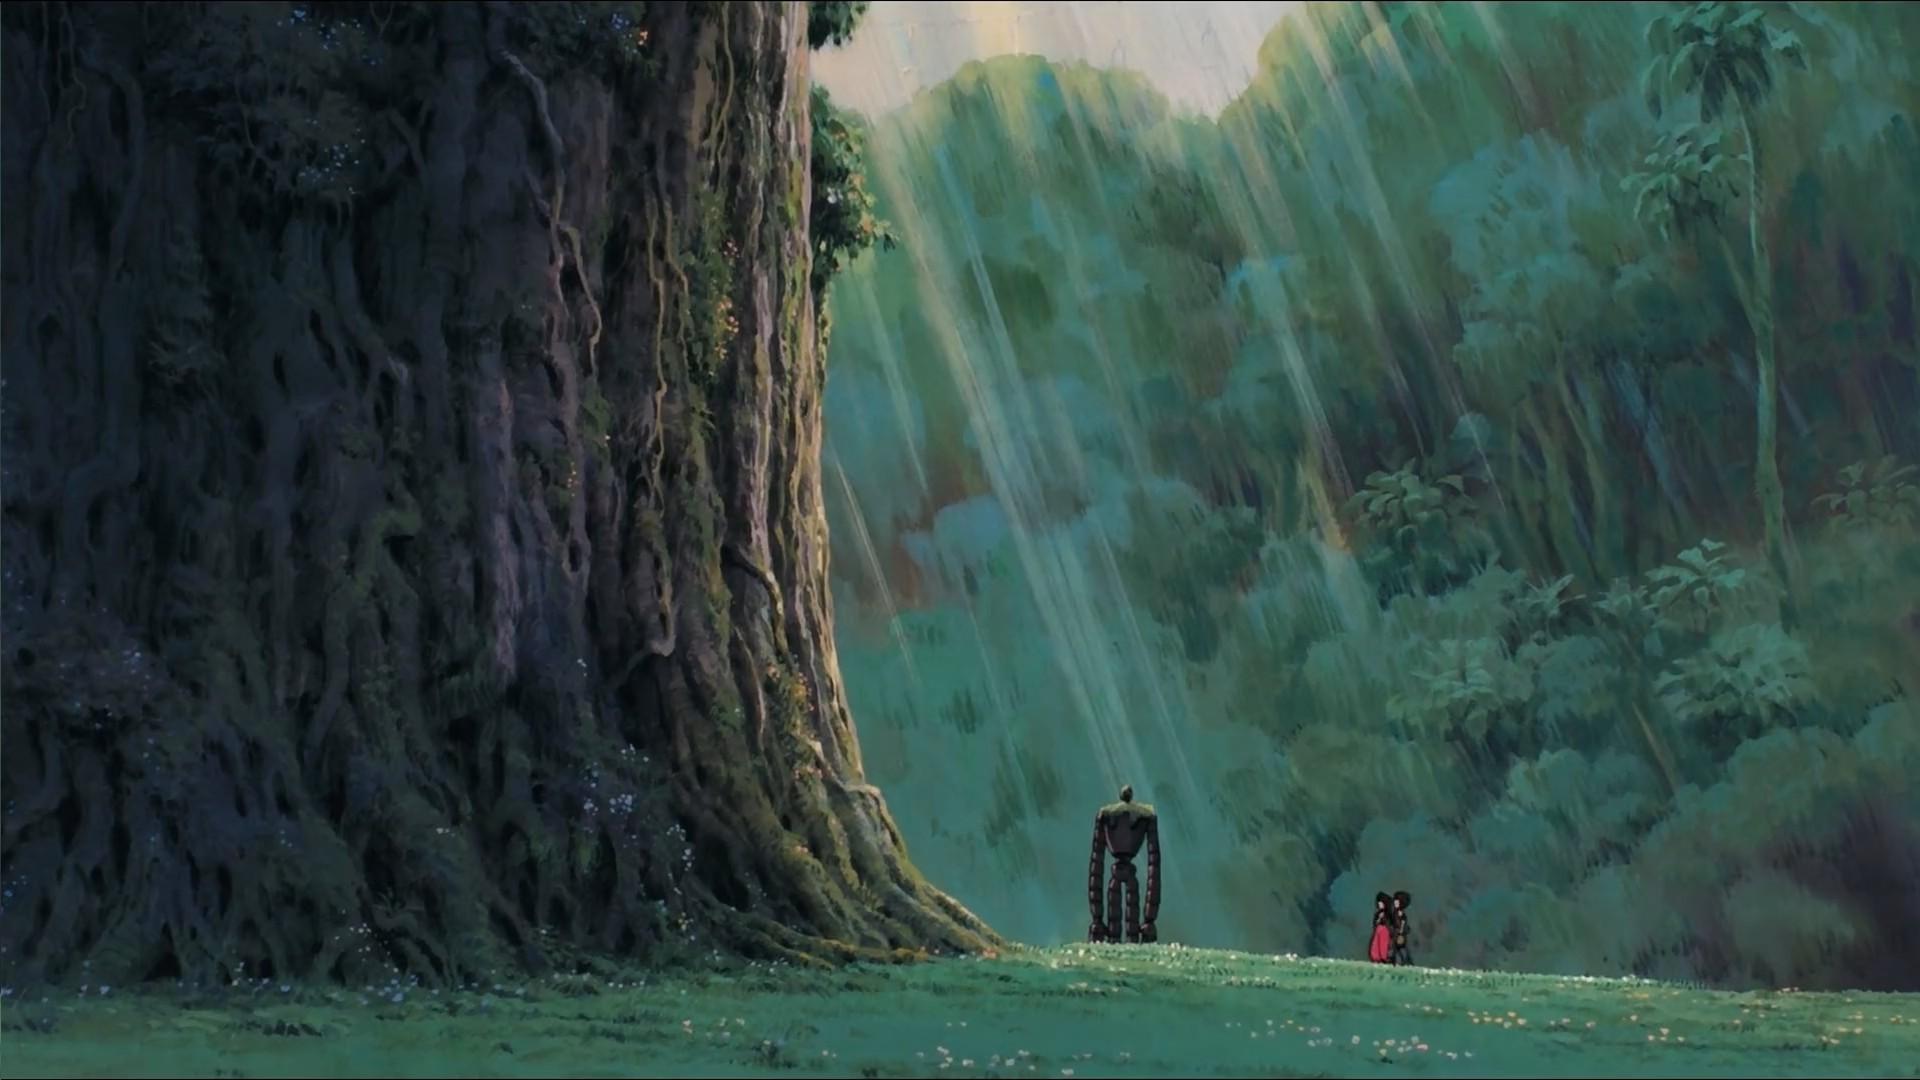 3d Moving Wallpapers For Mobile Studio Ghibli Wallpaper Hd Pixelstalk Net